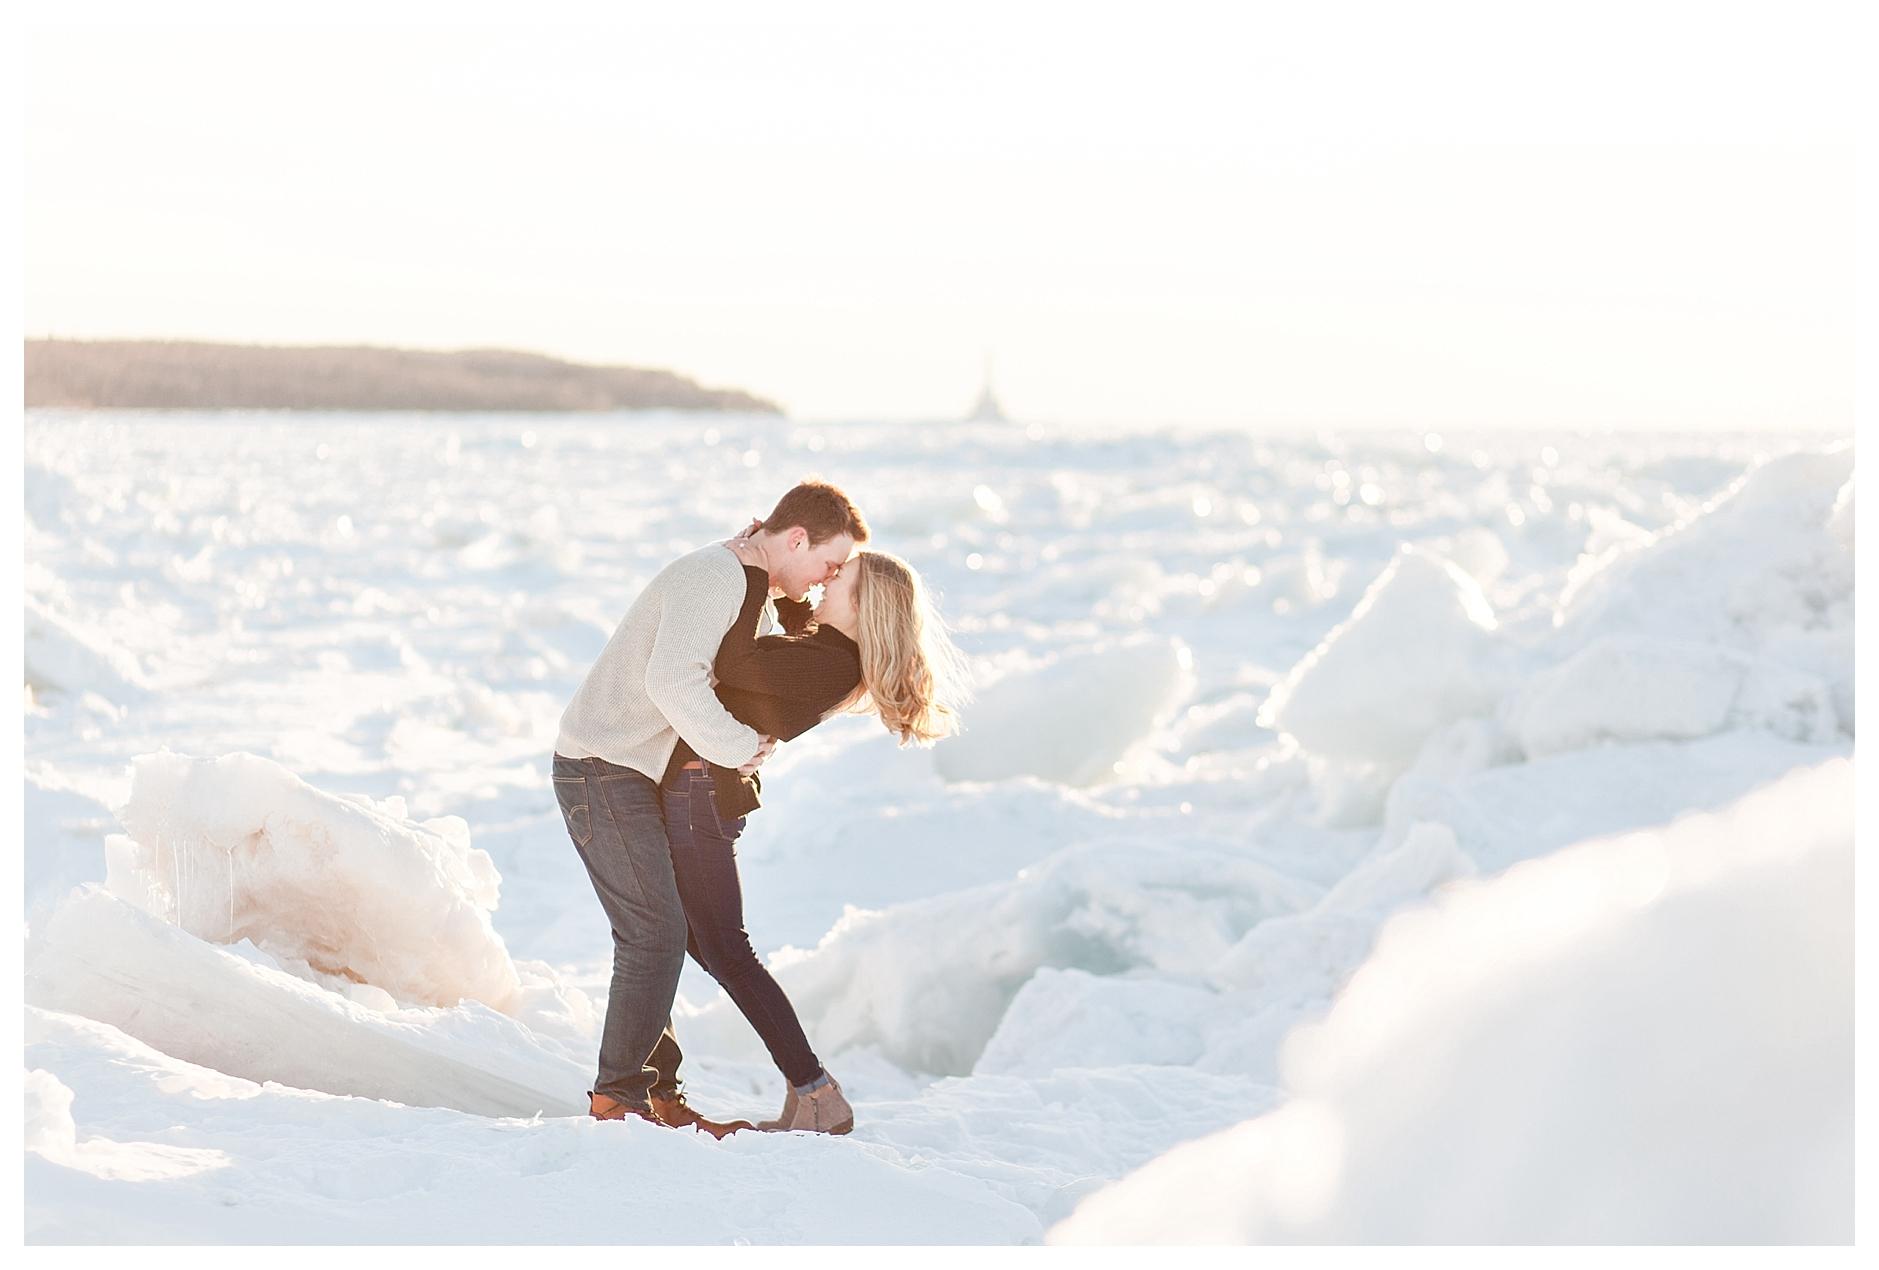 Jeff&Ashley Upper Peninsula Winter Engagement session_0059.jpg